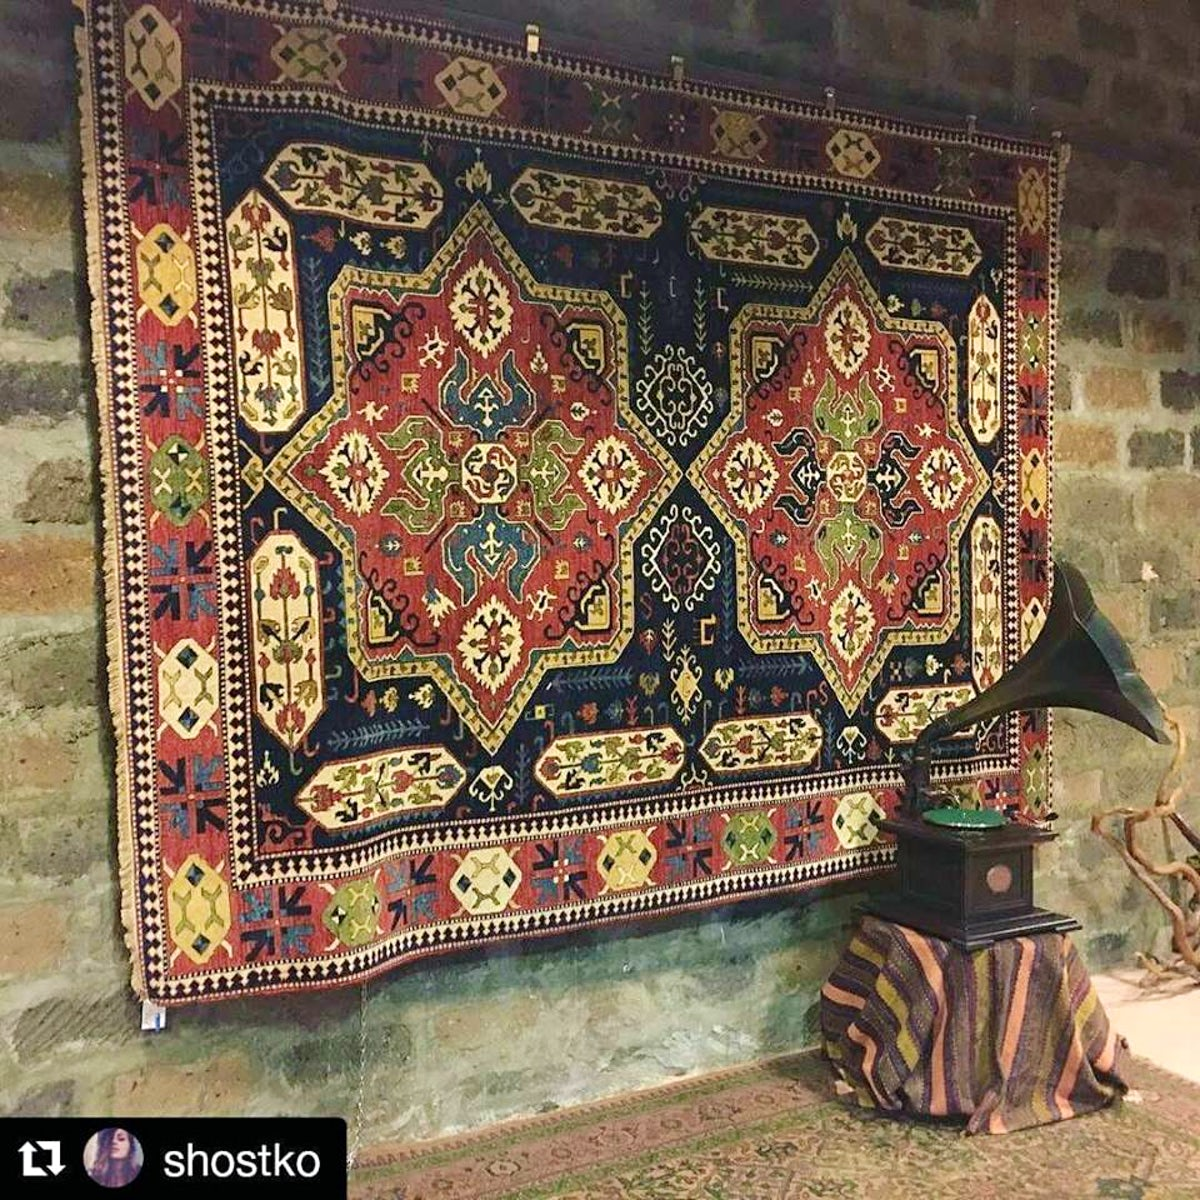 Armenian carpets: When art meets culture